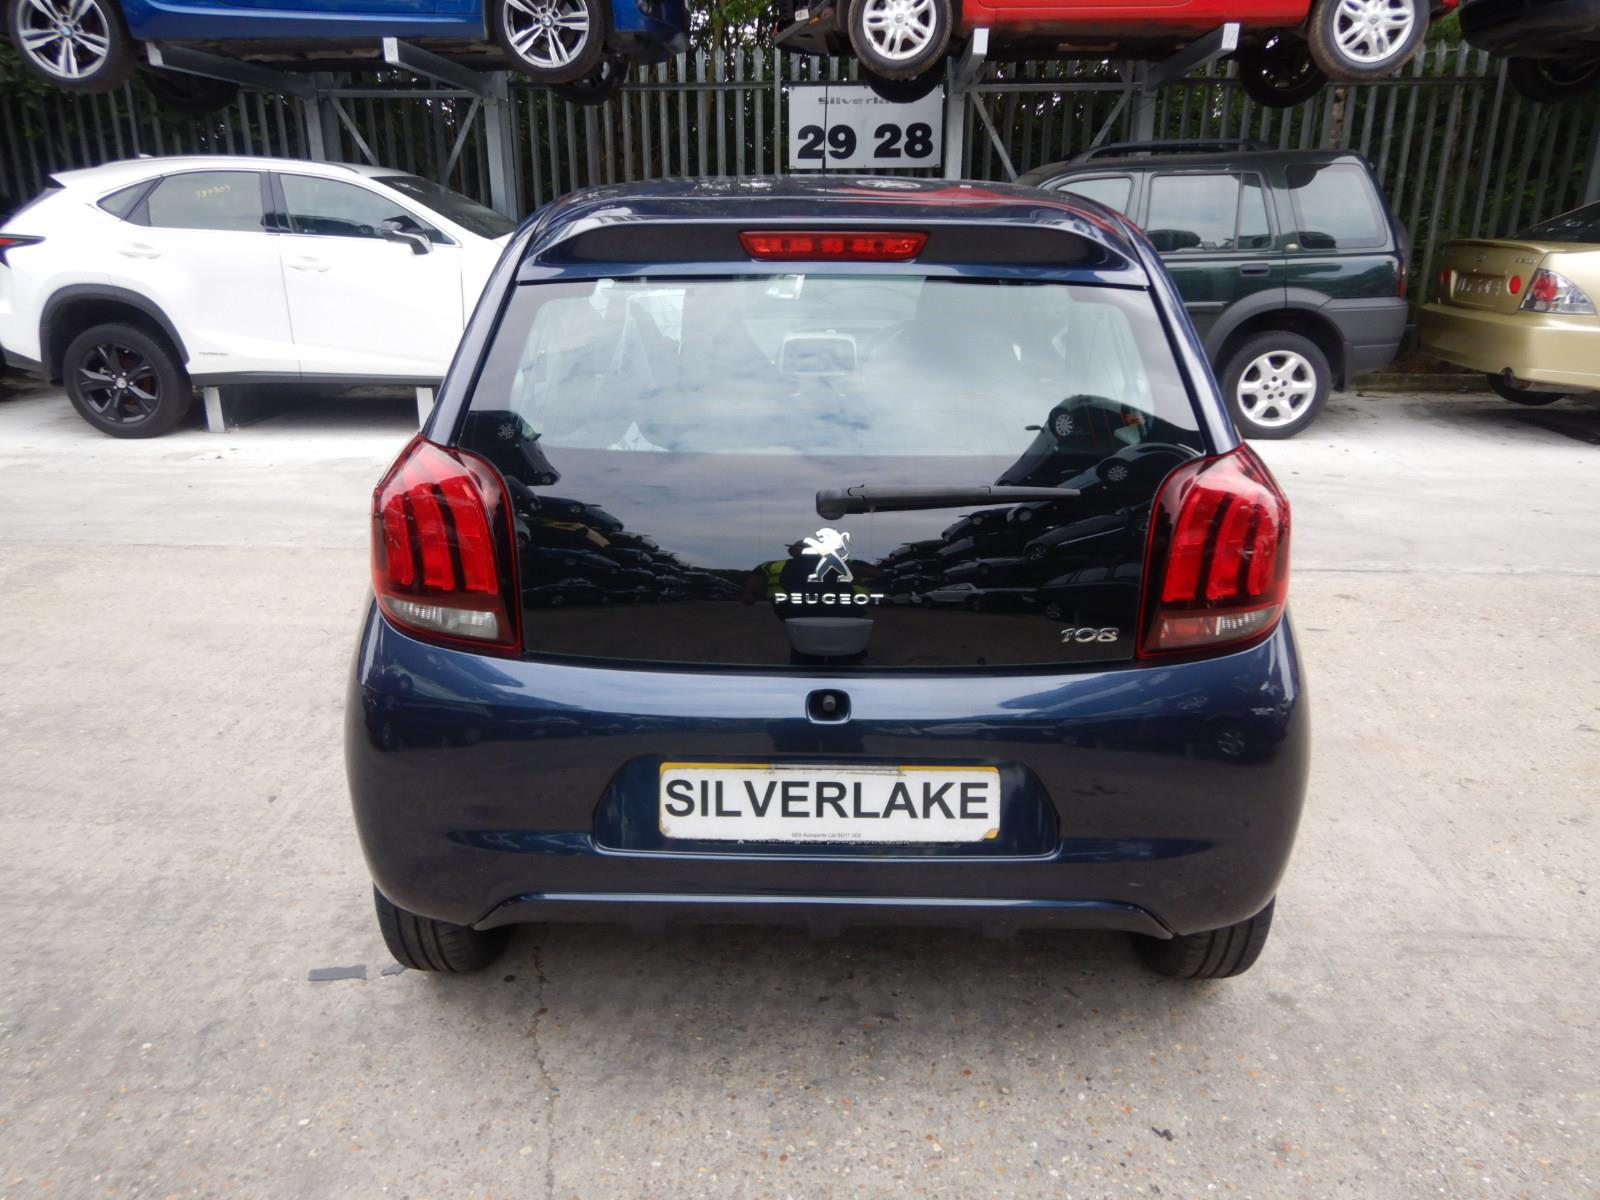 Peugeot 108 2014 On Active Vti 68 3 Door Hatchback Scrap Salvage 306 Fuse Box Brake Lights Car For Sale Auction Silverlake Autoparts